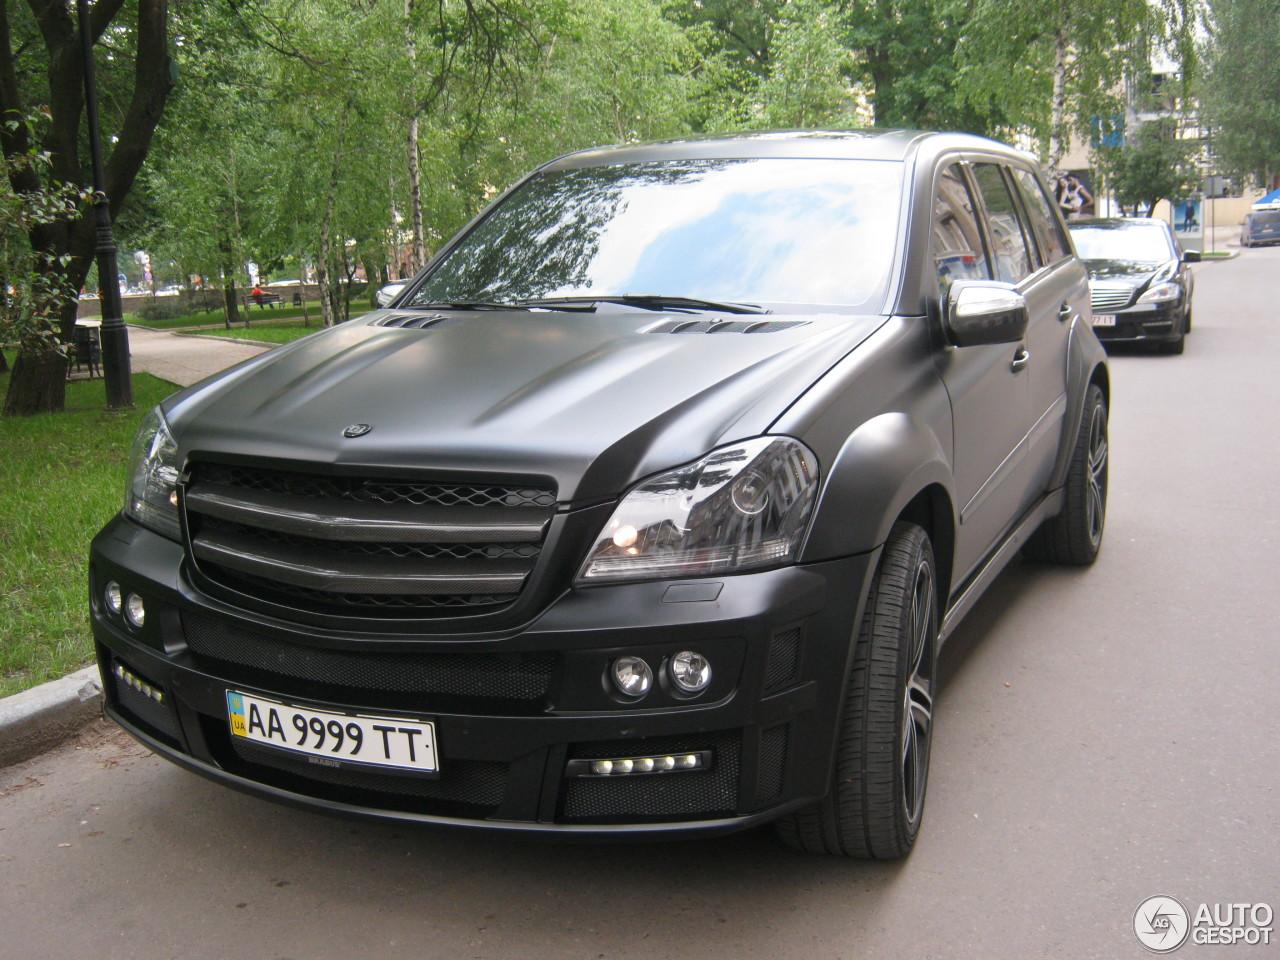 Mercedes benz brabus gl 63 biturbo 19 august 2014 for 08 mercedes benz